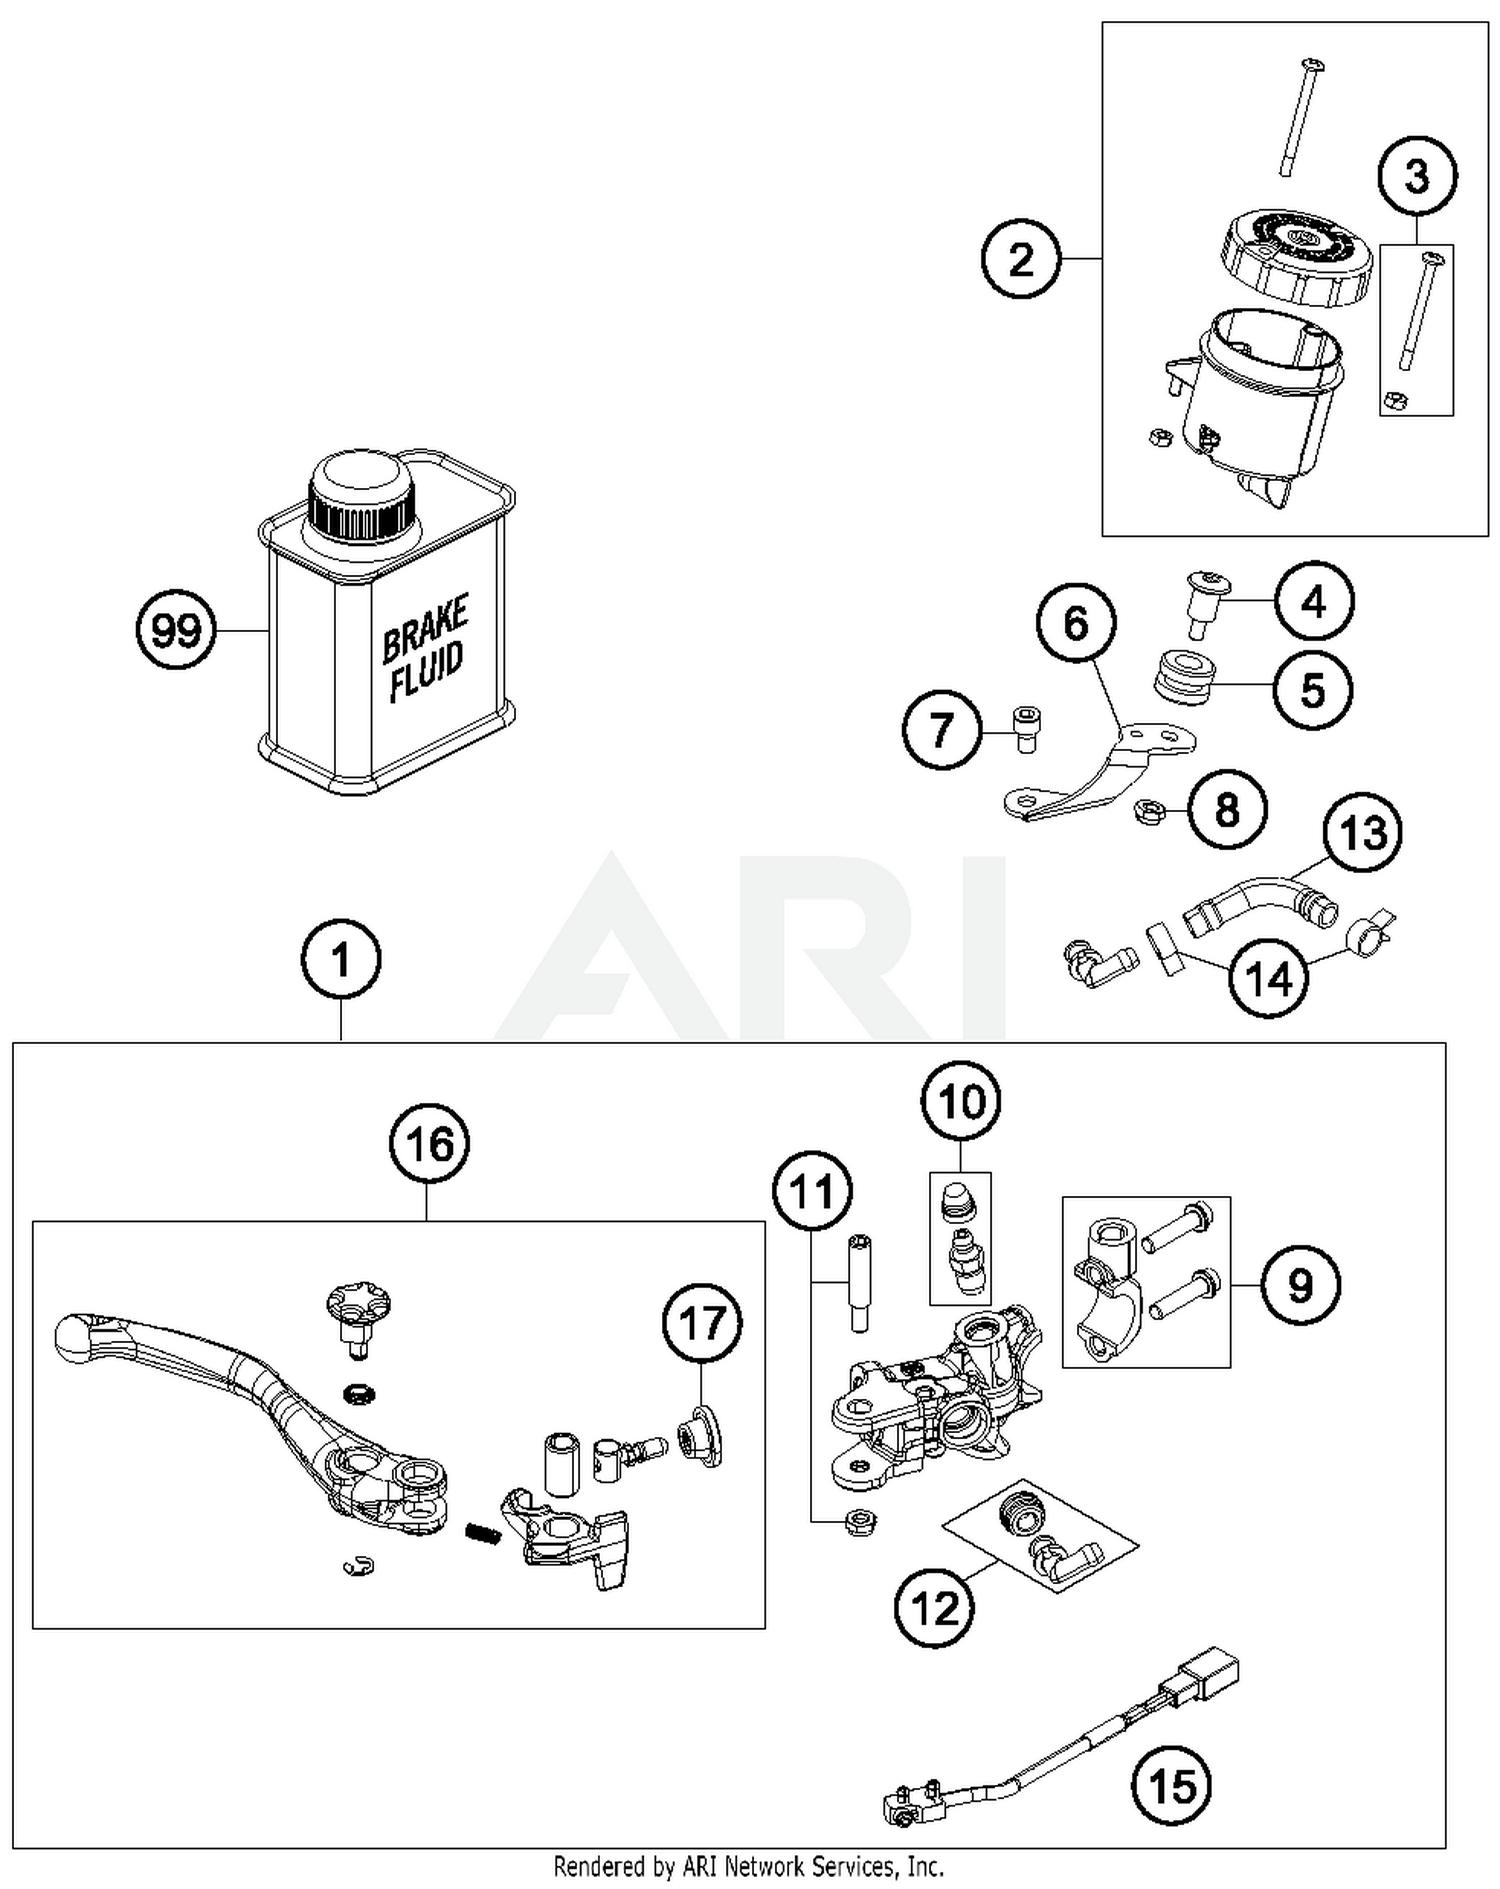 Hyland Brakes Cylinder Diagram Wiring Fuse Box 1954 Dodge 2004 Brake Trusted Diagrams U2022 Rh Caribbeanblues Co 1993 Ford F 350